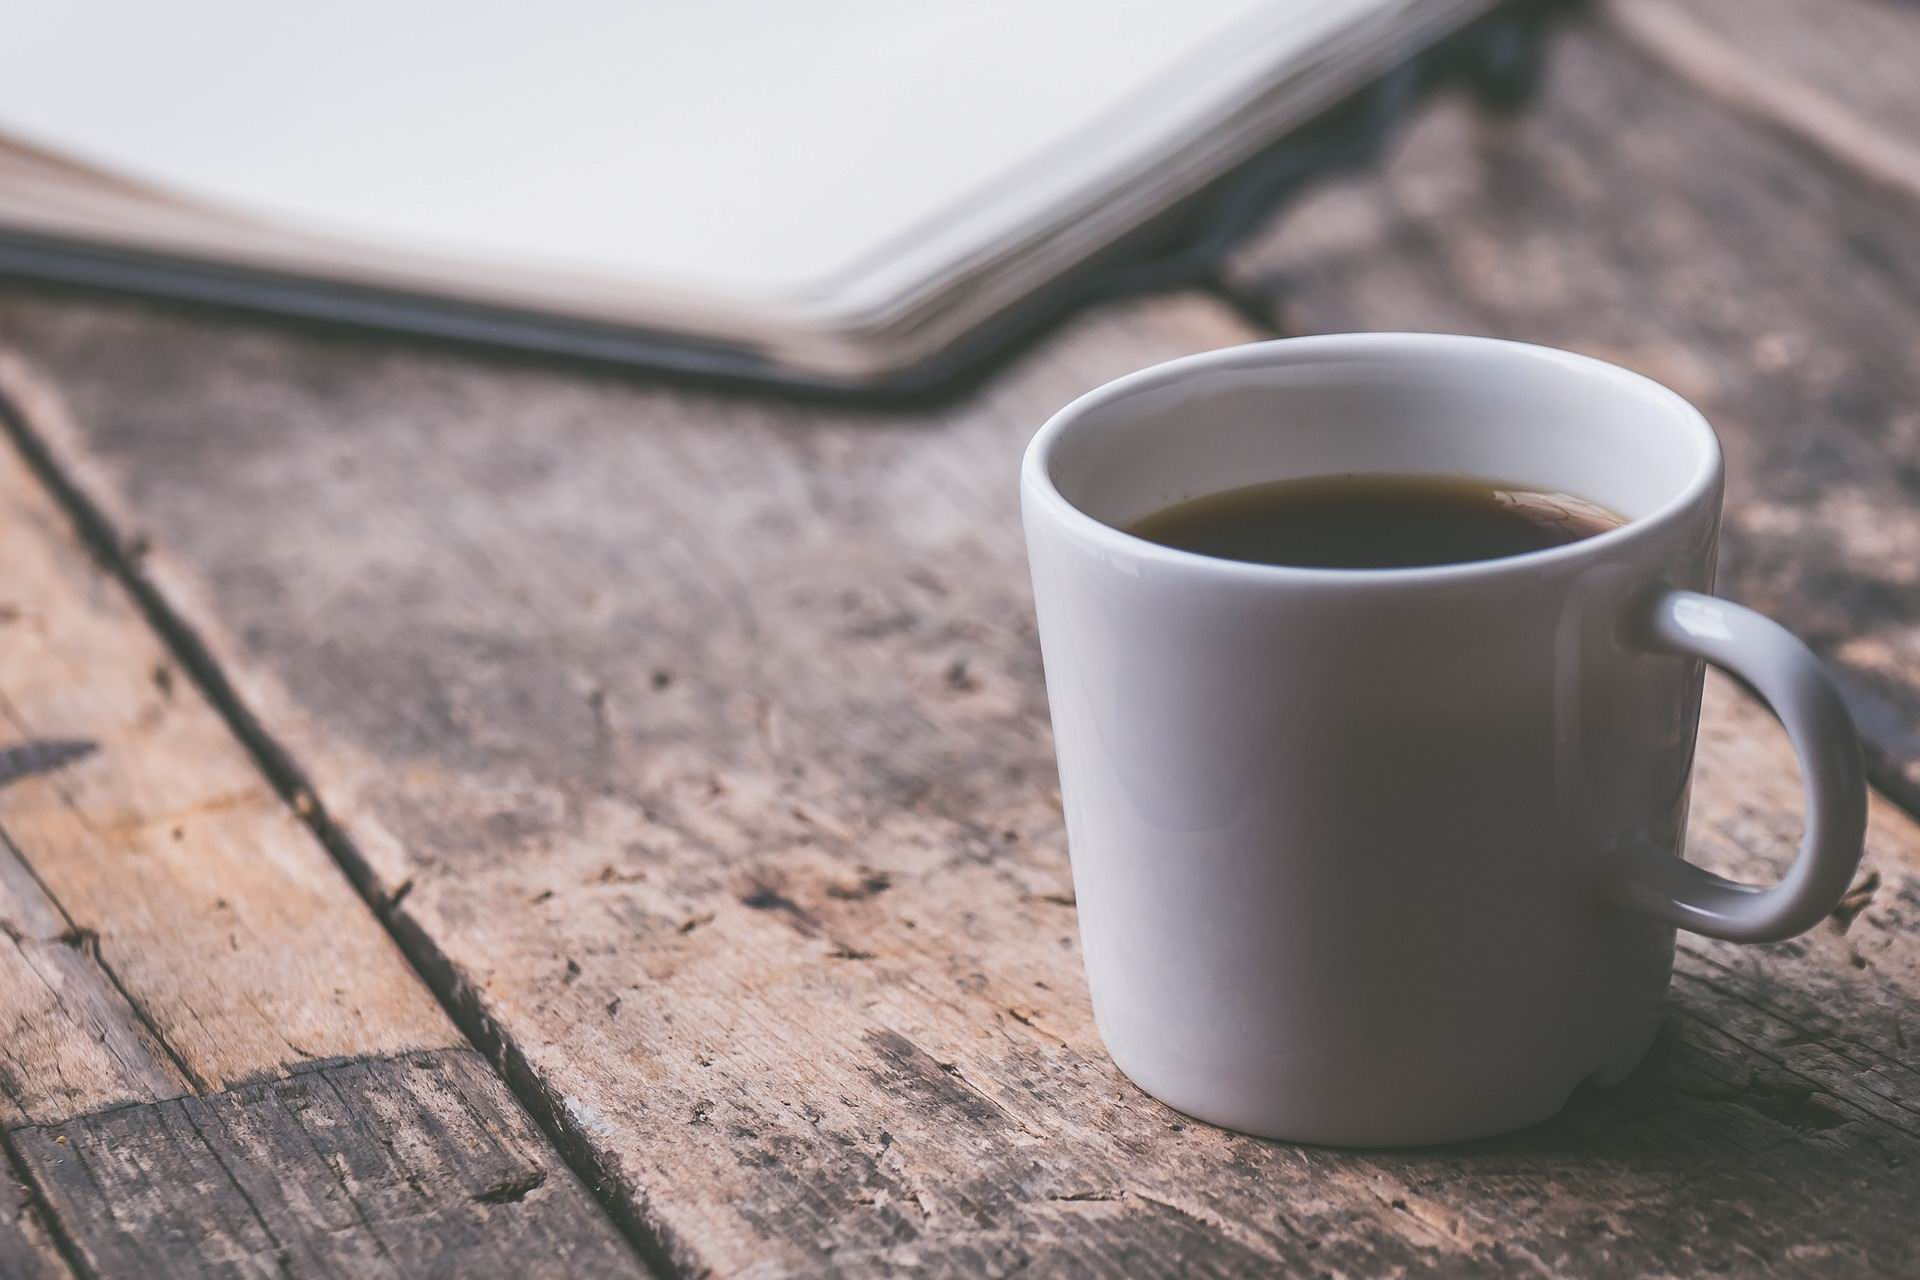 COFFEE ON WOODEN BENCH -- David Schwarzenberg -- PX